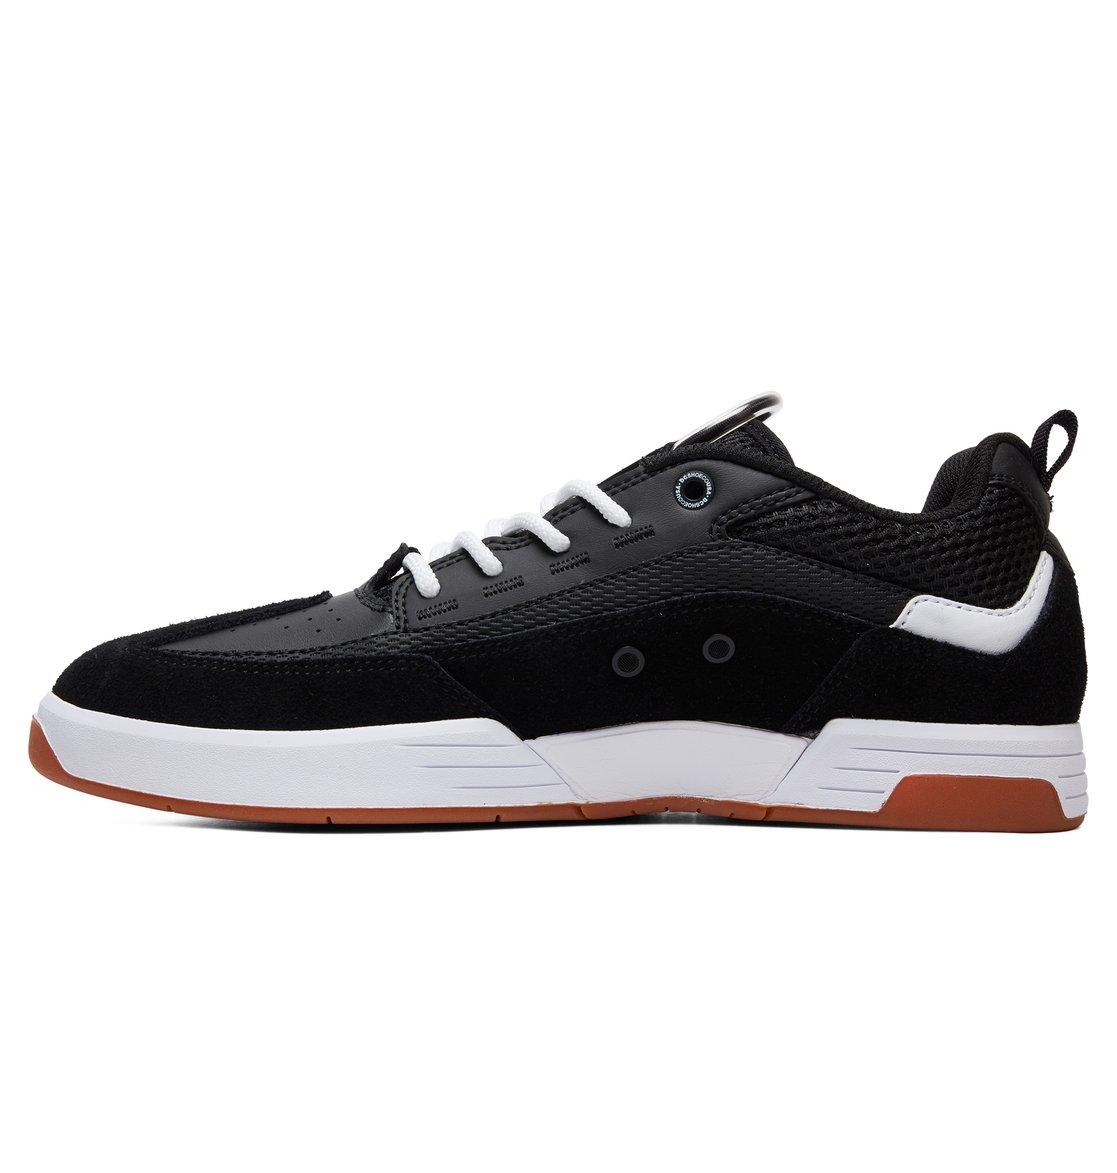 DC-Shoes-Legacy-98-Slim-Zapatos-para-Hombre-ADYS100445 miniatura 7